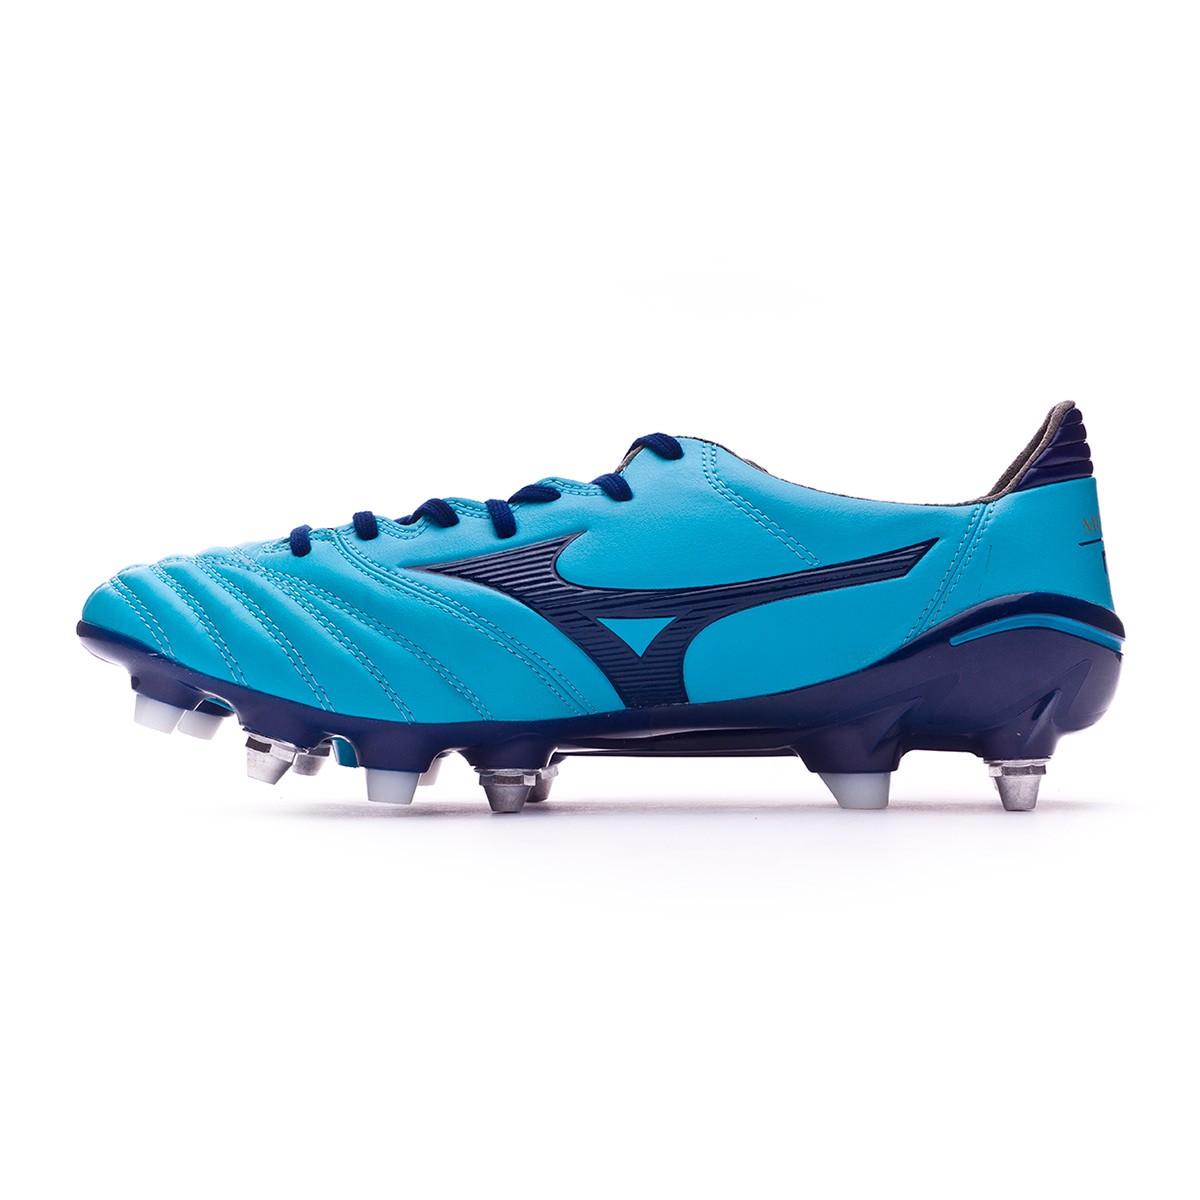 7bf5e83080e3a Bota de fútbol Mizuno Morelia NEO II MIX Blue Atomic-Blue depth - Tienda de fútbol  Fútbol Emotion